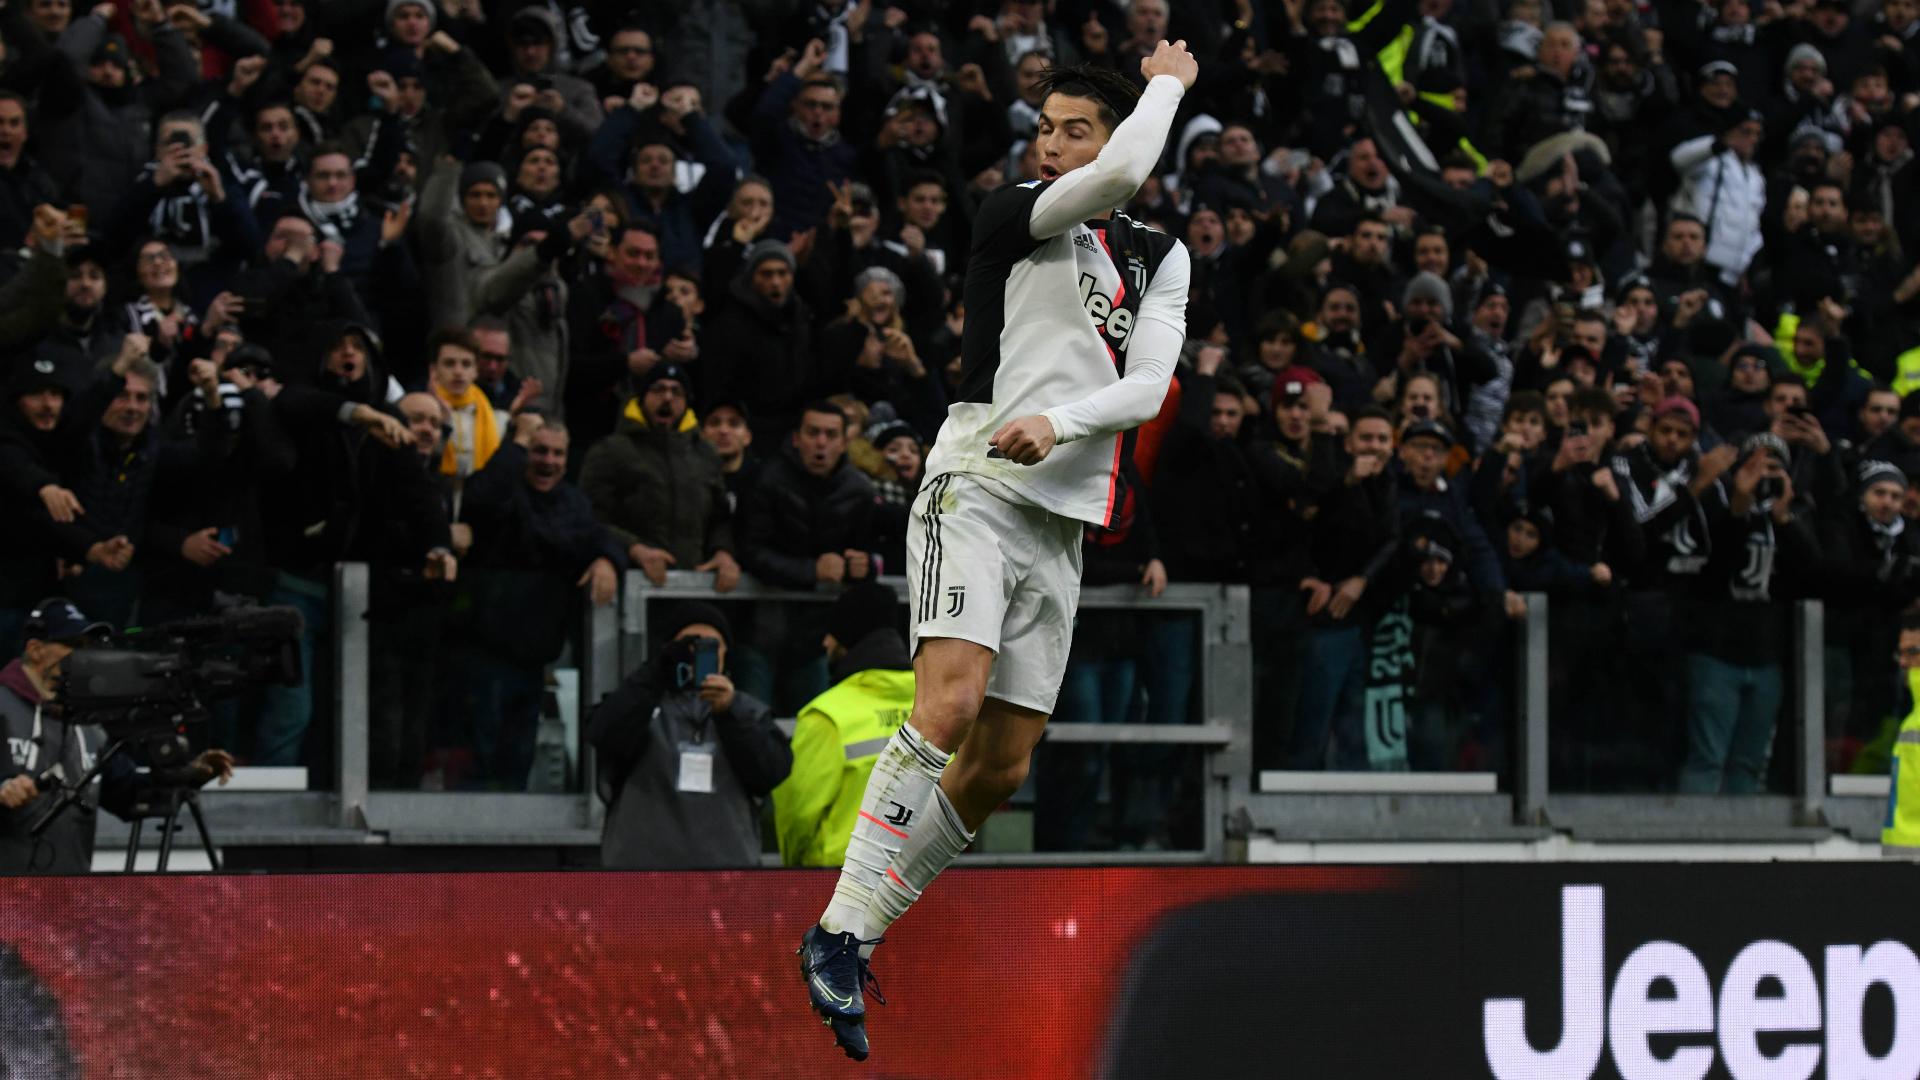 Ronaldo teaches Djokovic 'how to jump' in training video